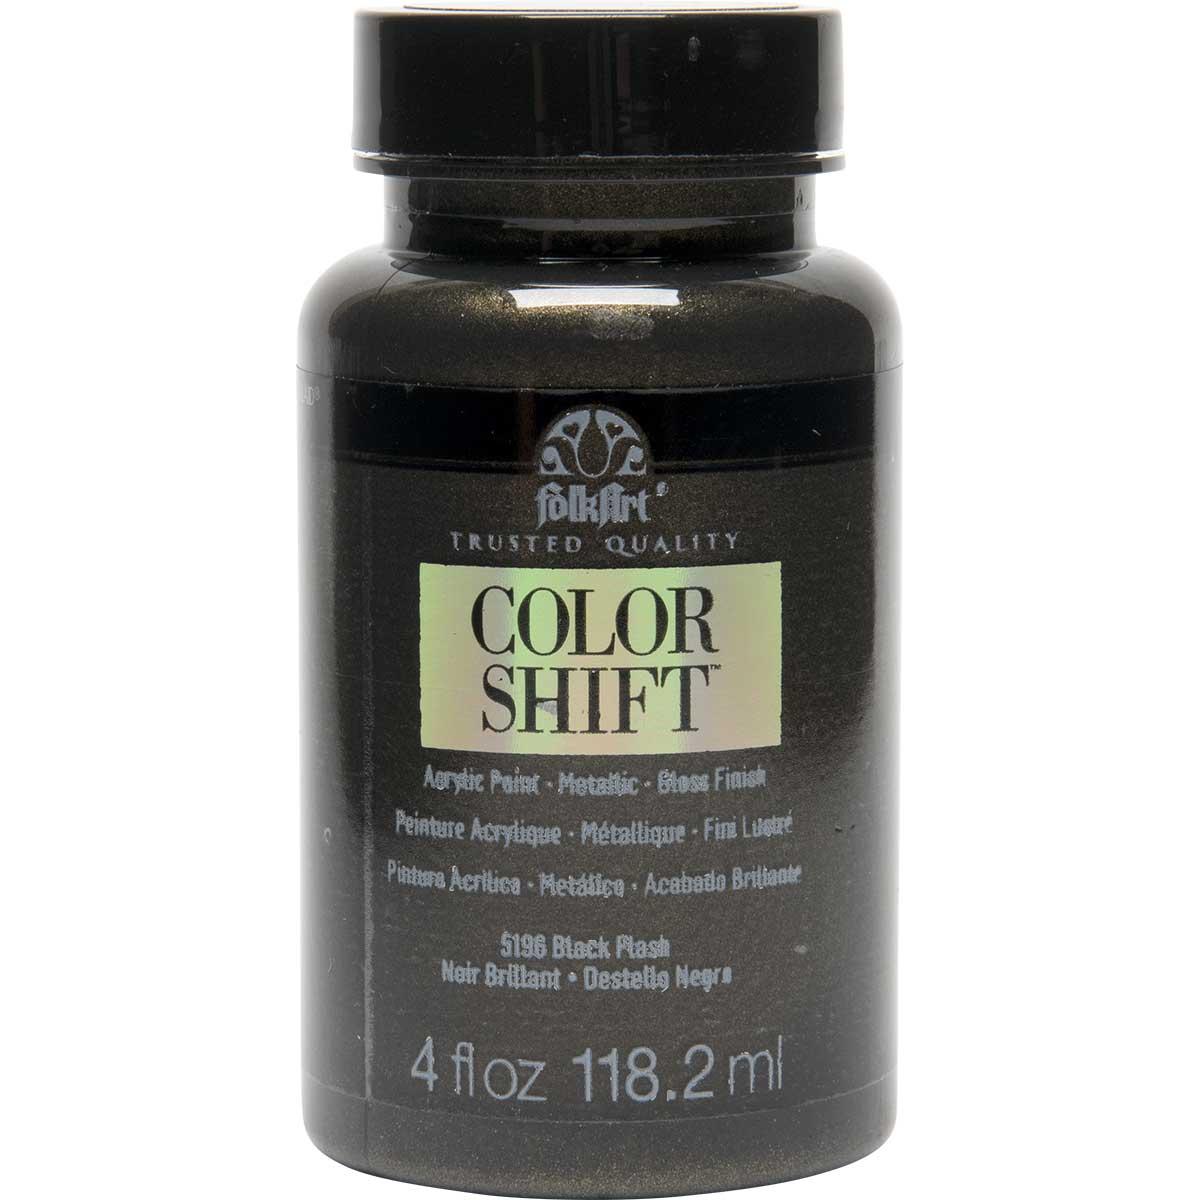 FolkArt ® Color Shift™ Acrylic Paint - Black Flash, 4 oz.